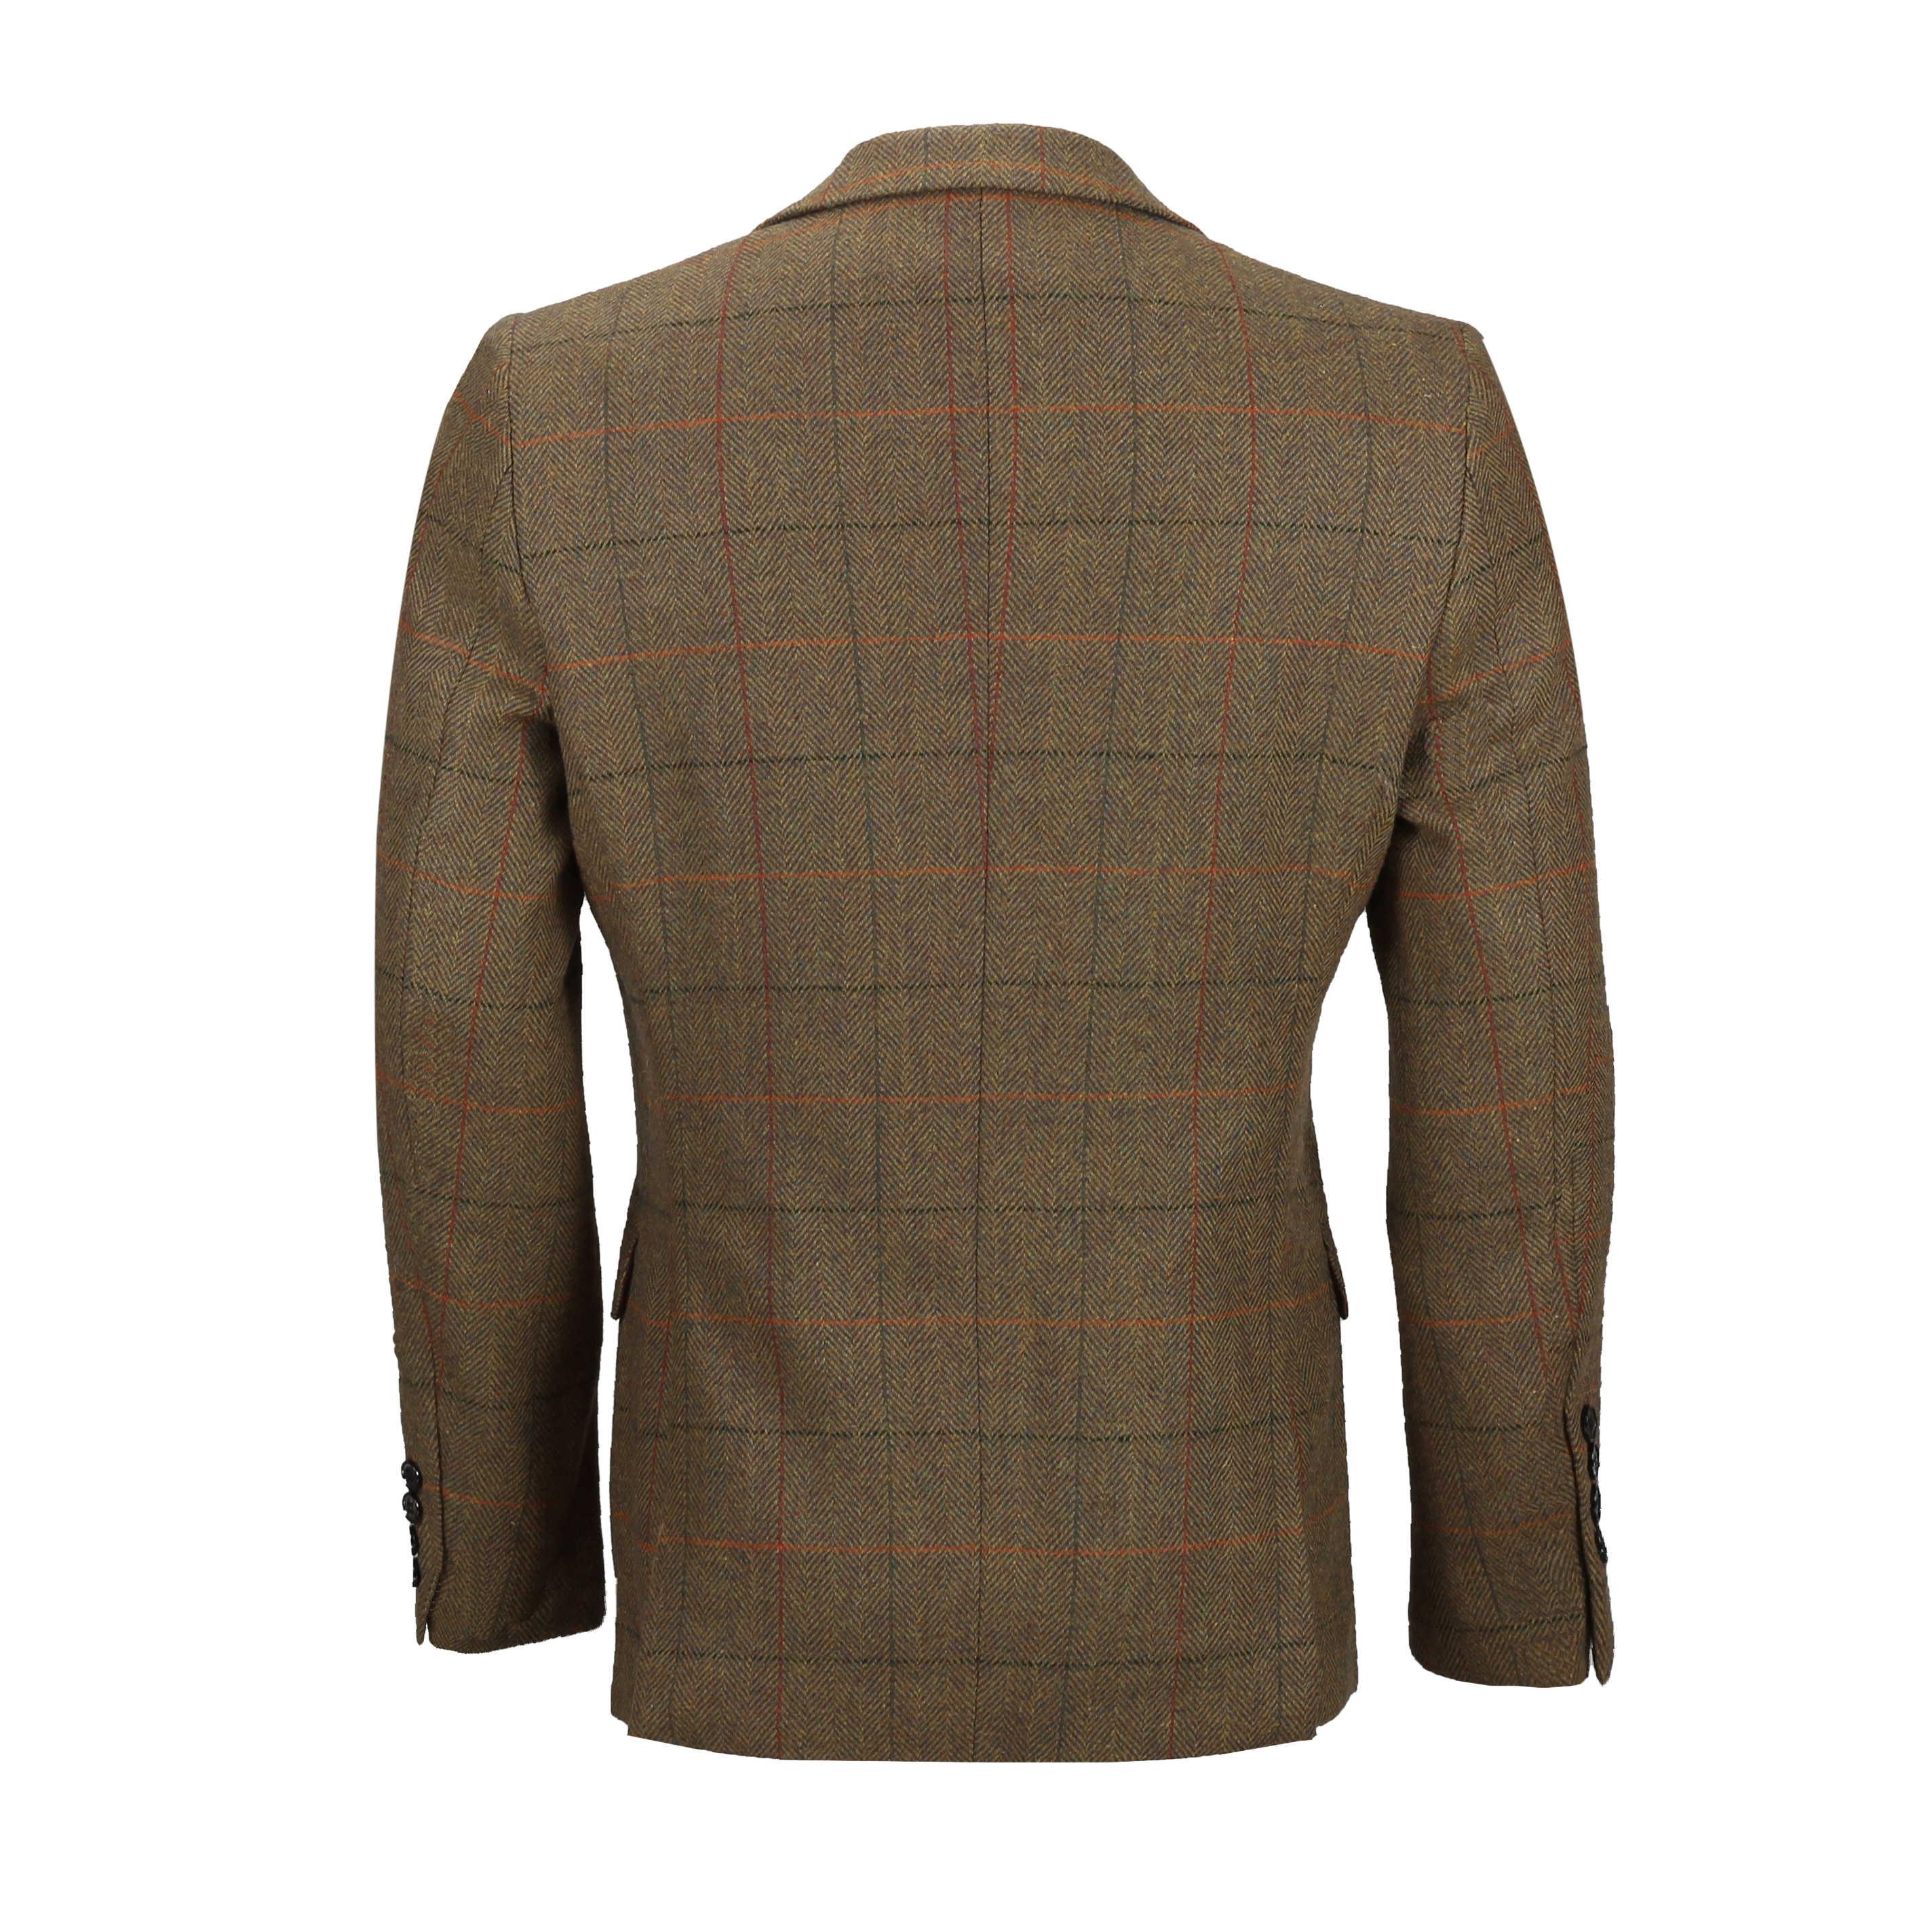 Mens-3-piezas-tan-comprueba-Herringbone-Traje-Blazer-Chaleco-Pantalones-Se-Venden-Por-Separado miniatura 8